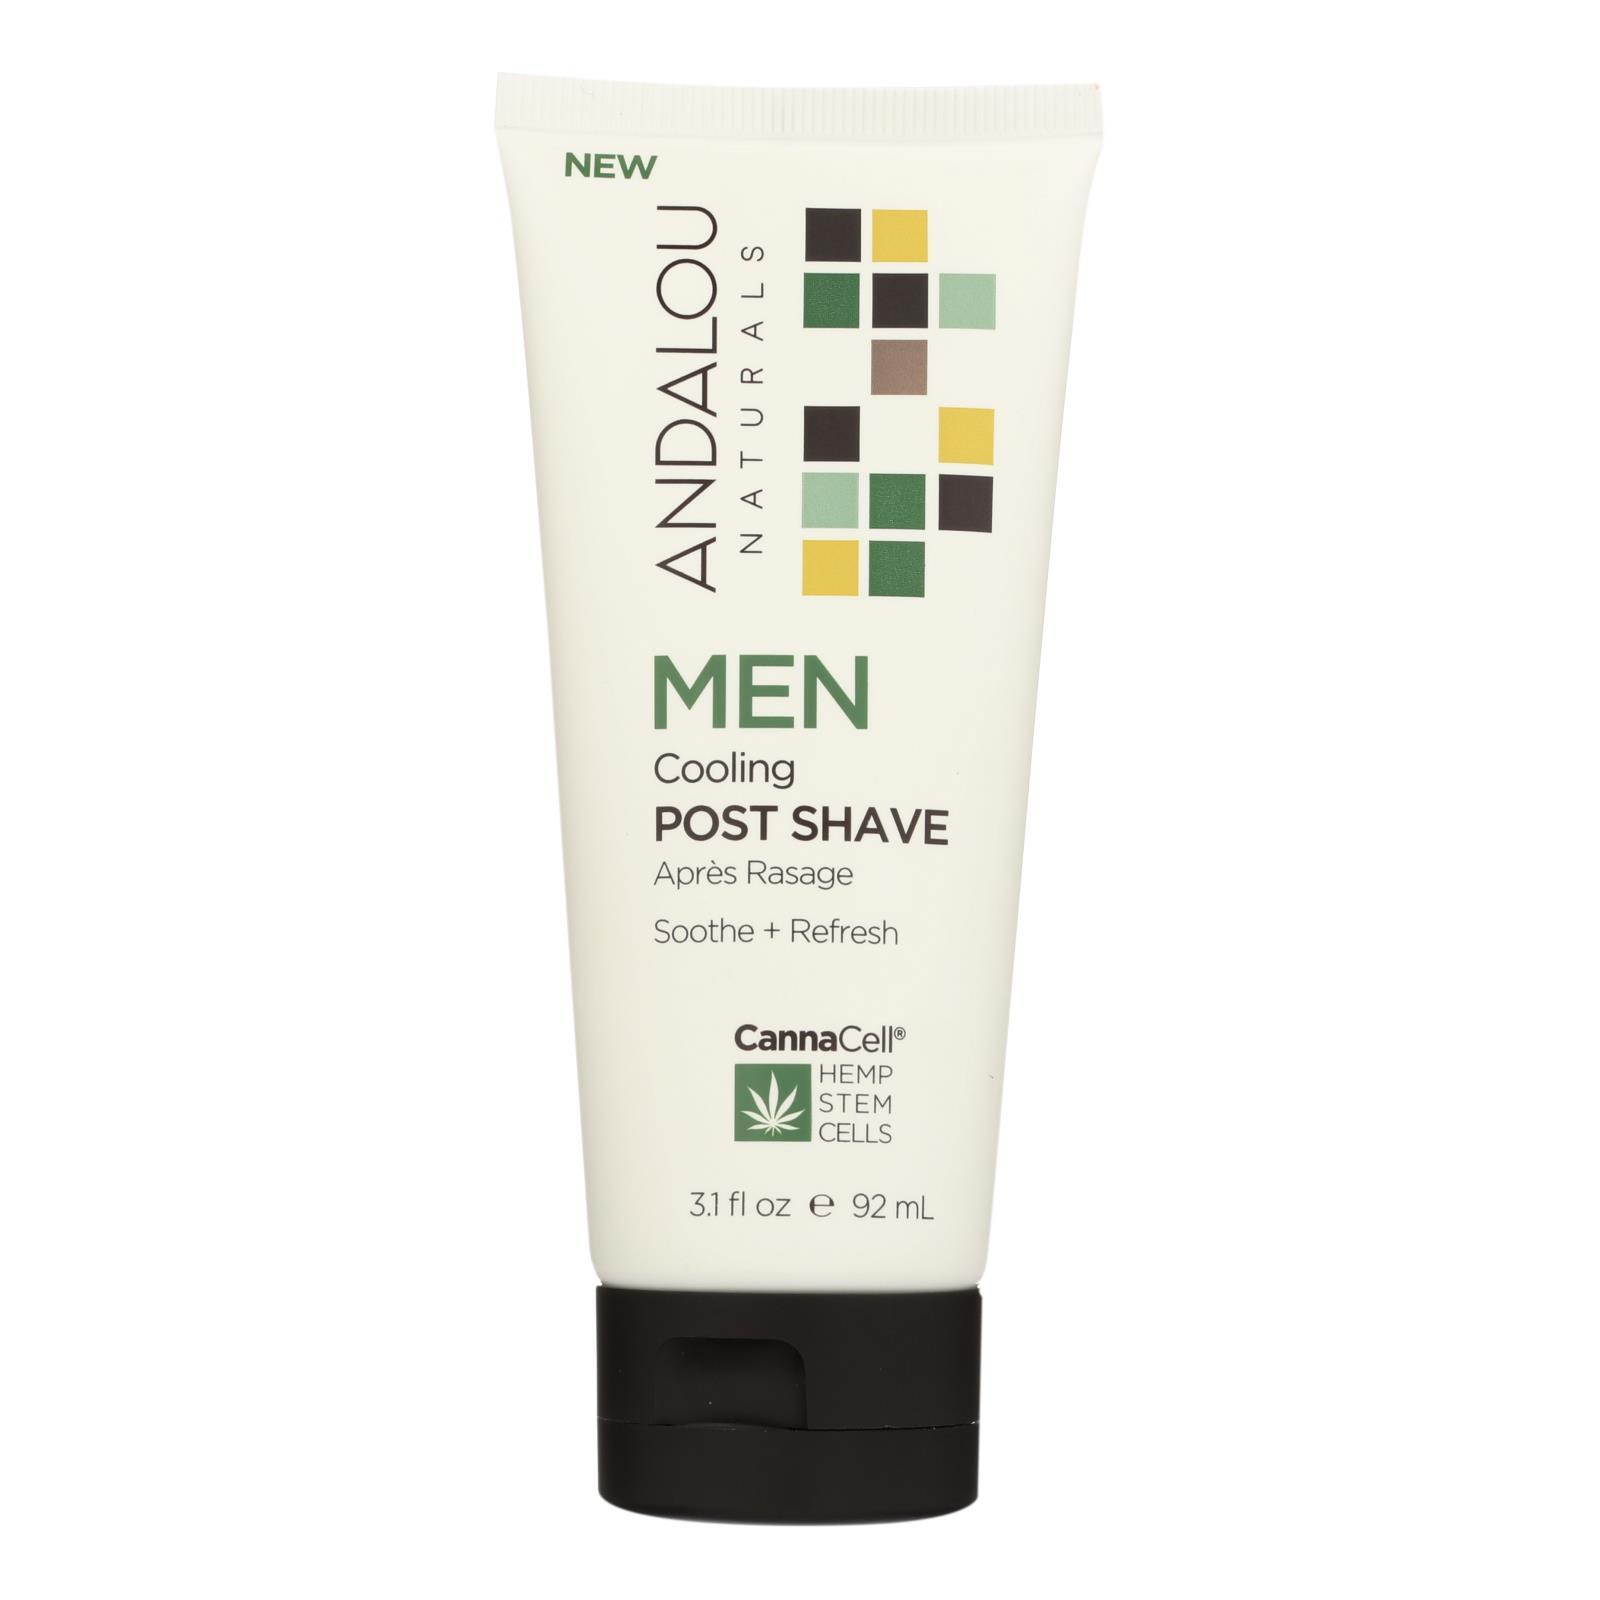 Andalou Naturals - MEN Cooling Post Shave - 3.1 fl oz.